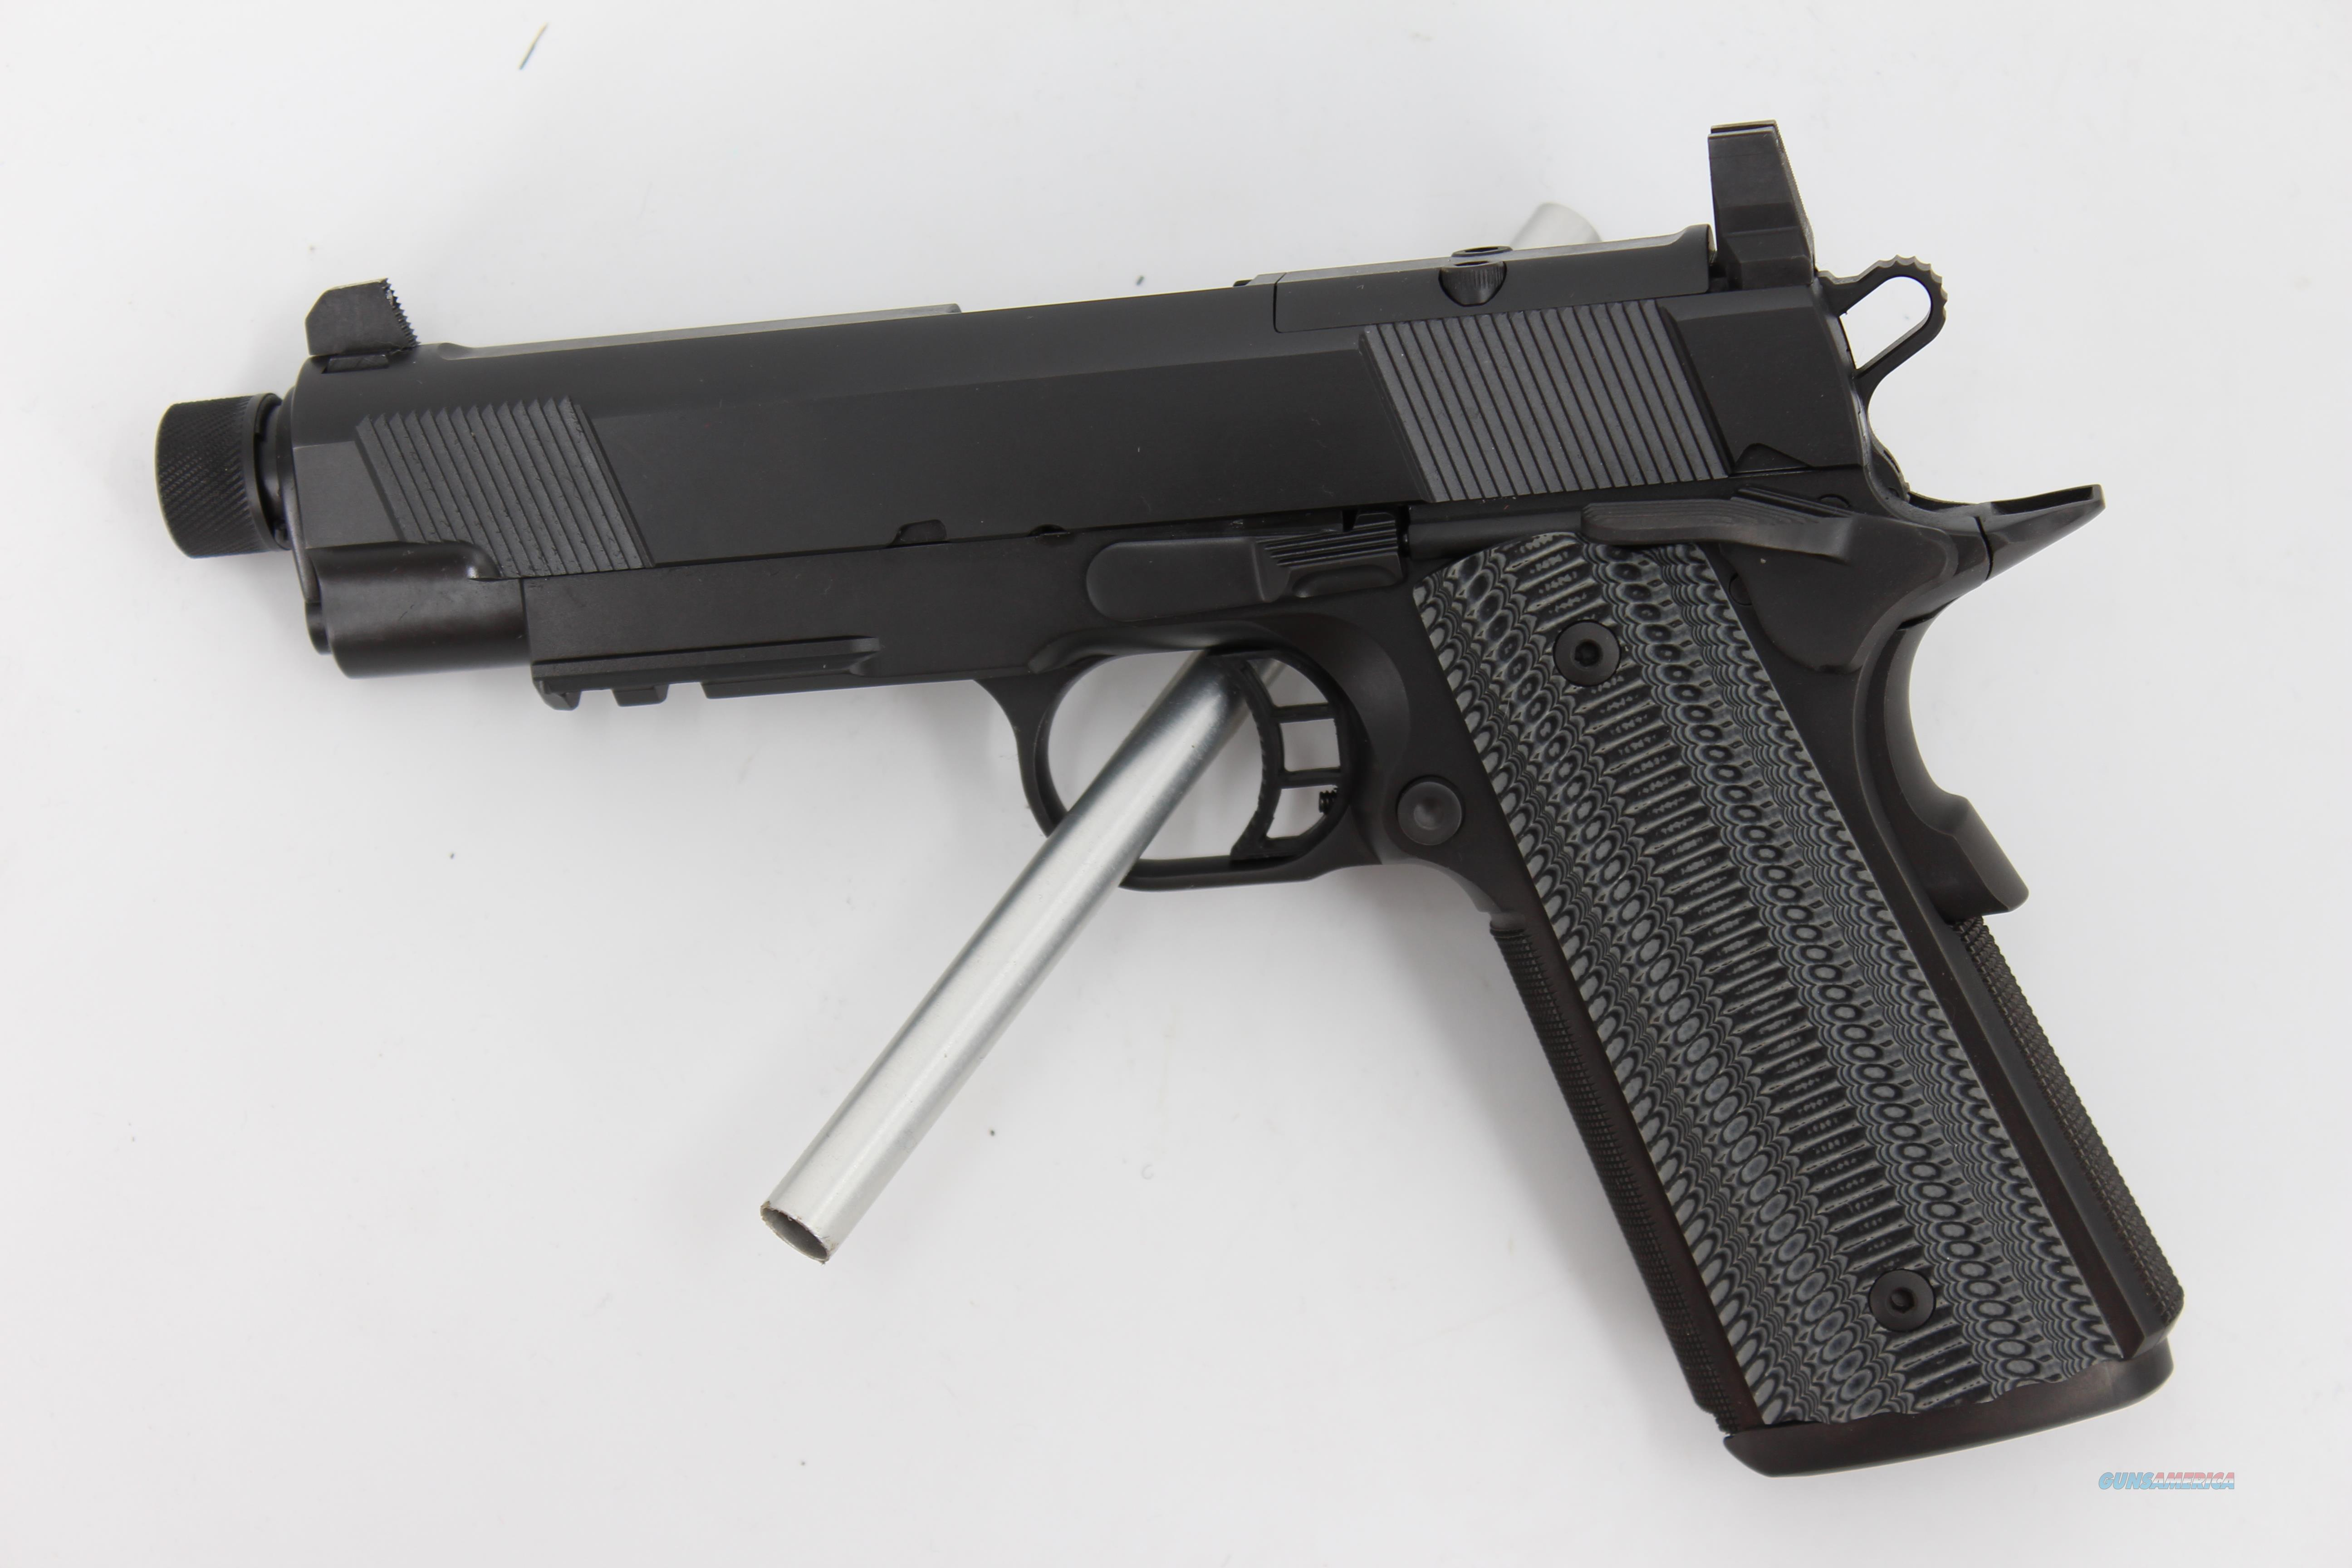 STI HOST Tactical SS TR 4.0 45ACP 8+1  Guns > Pistols > STI Pistols